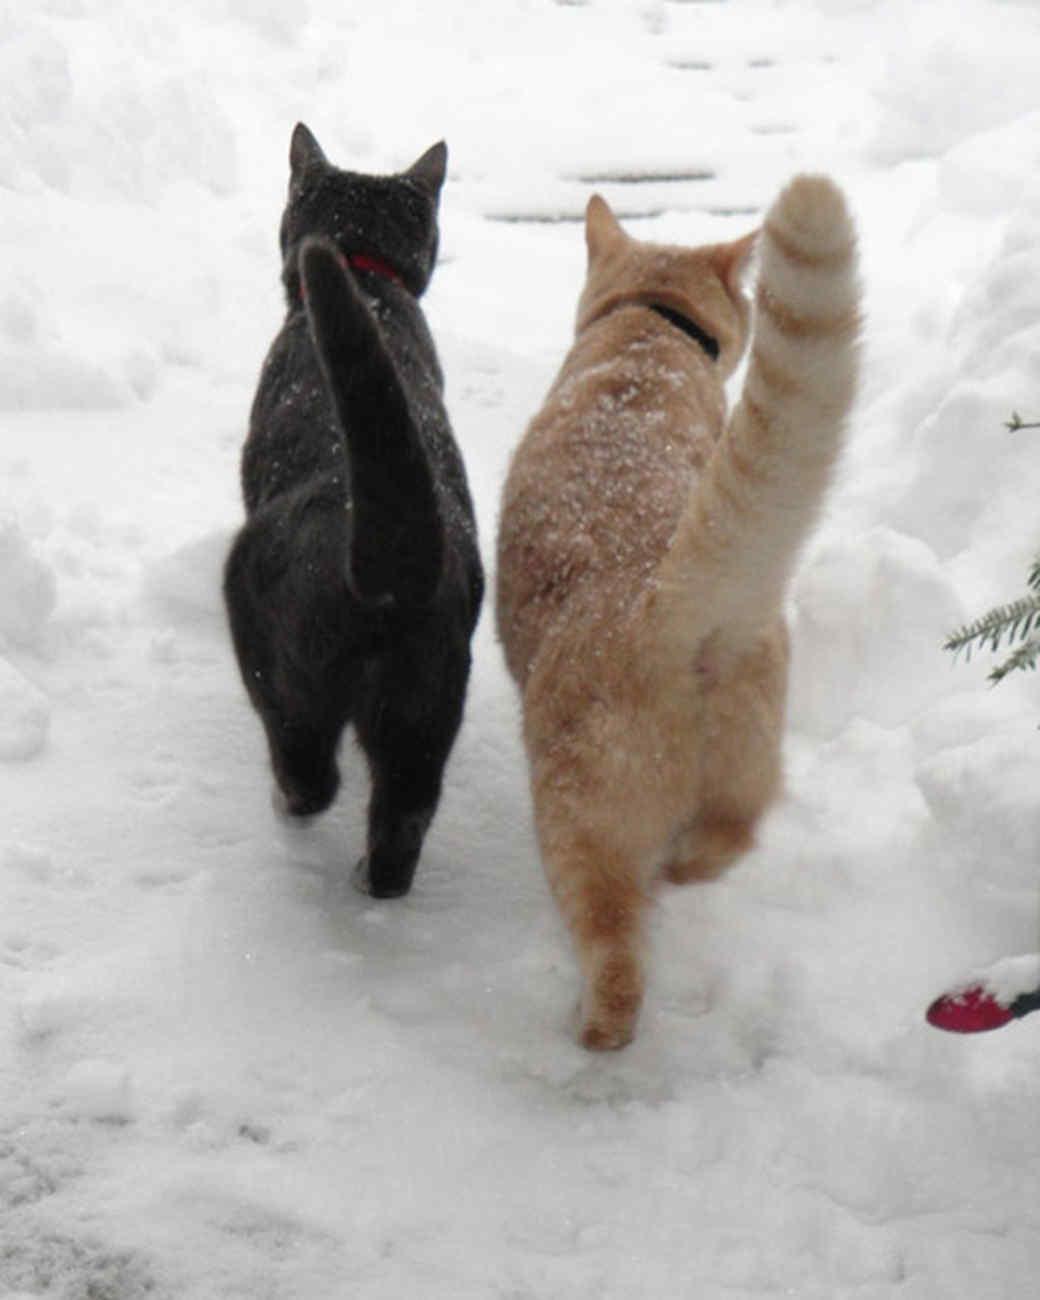 pets_snowangels_7334253_122717_19295698.jpg